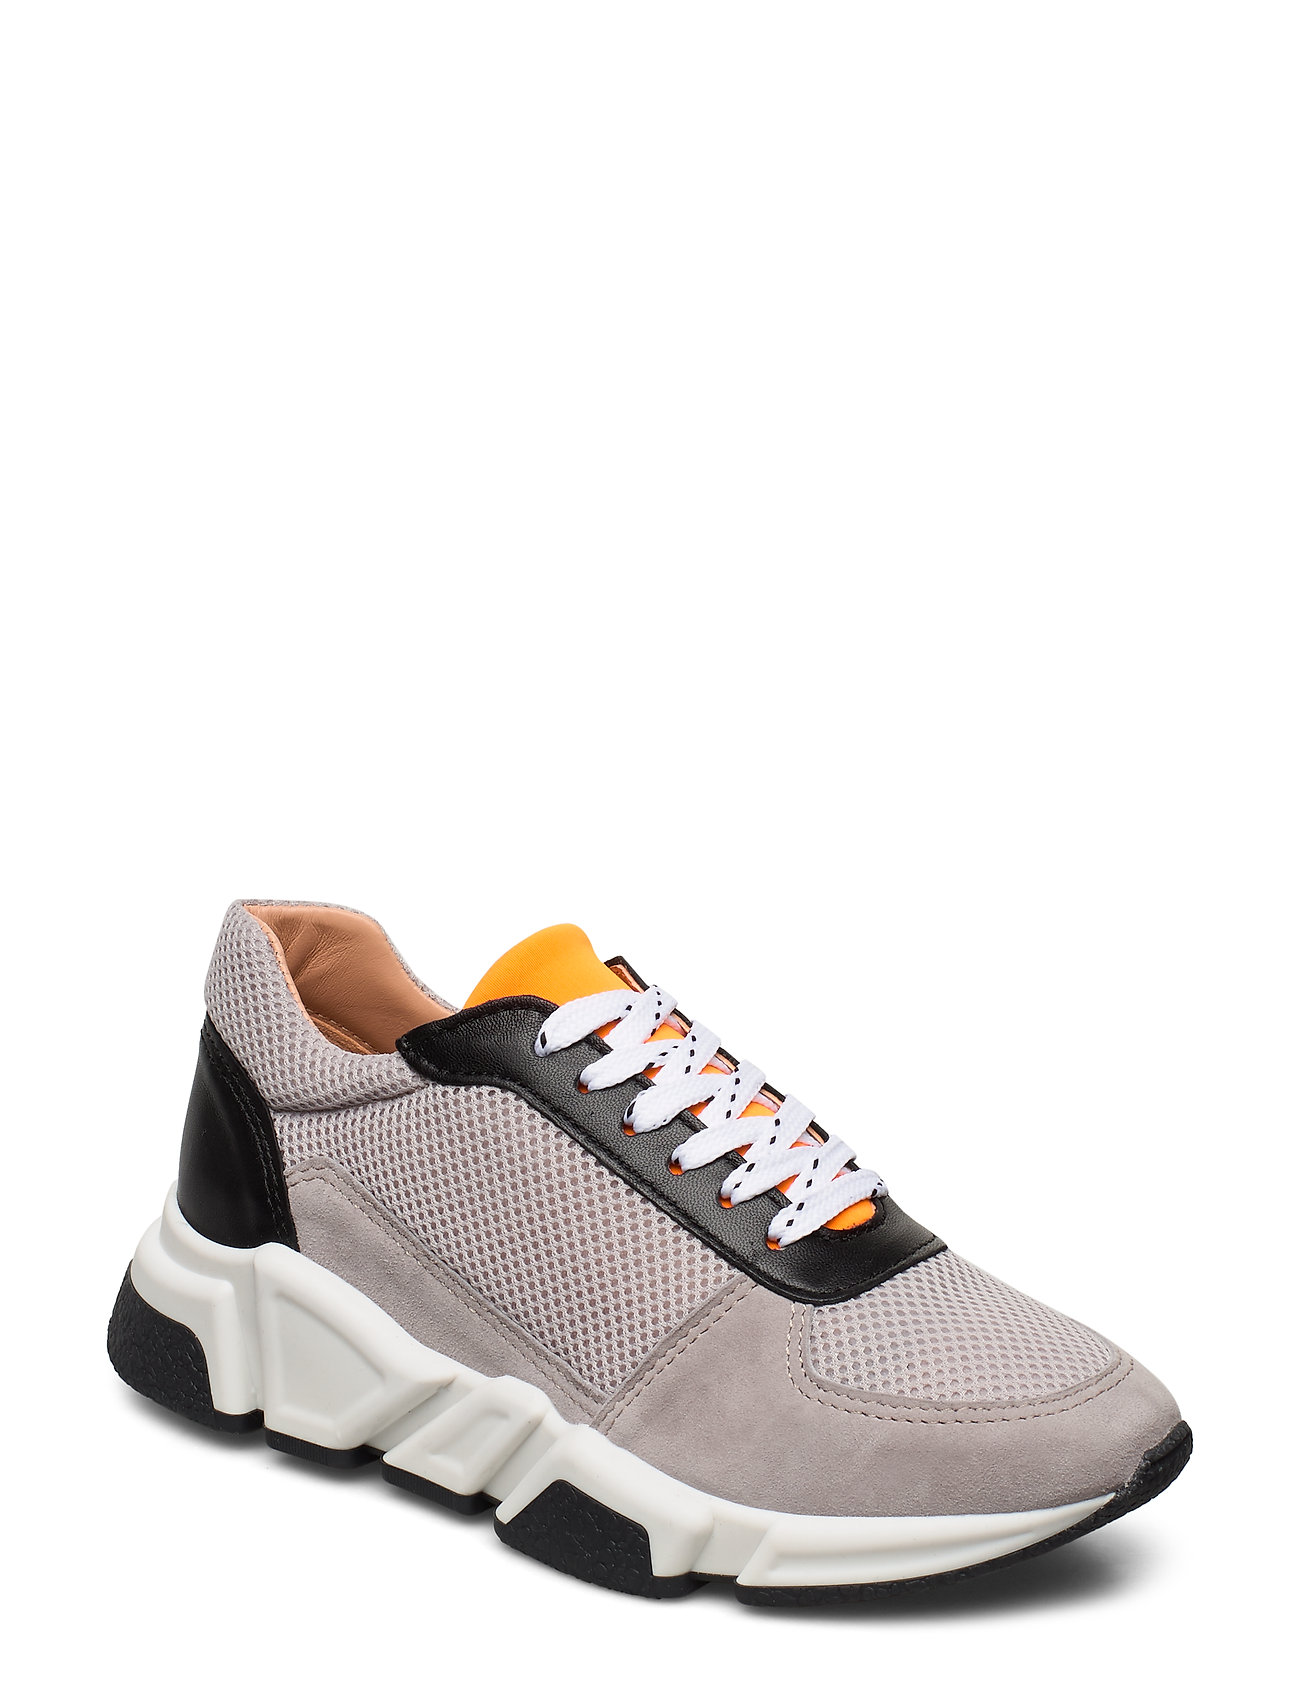 Image of Sport 14261 Low-top Sneakers Grå Billi Bi (3329983675)